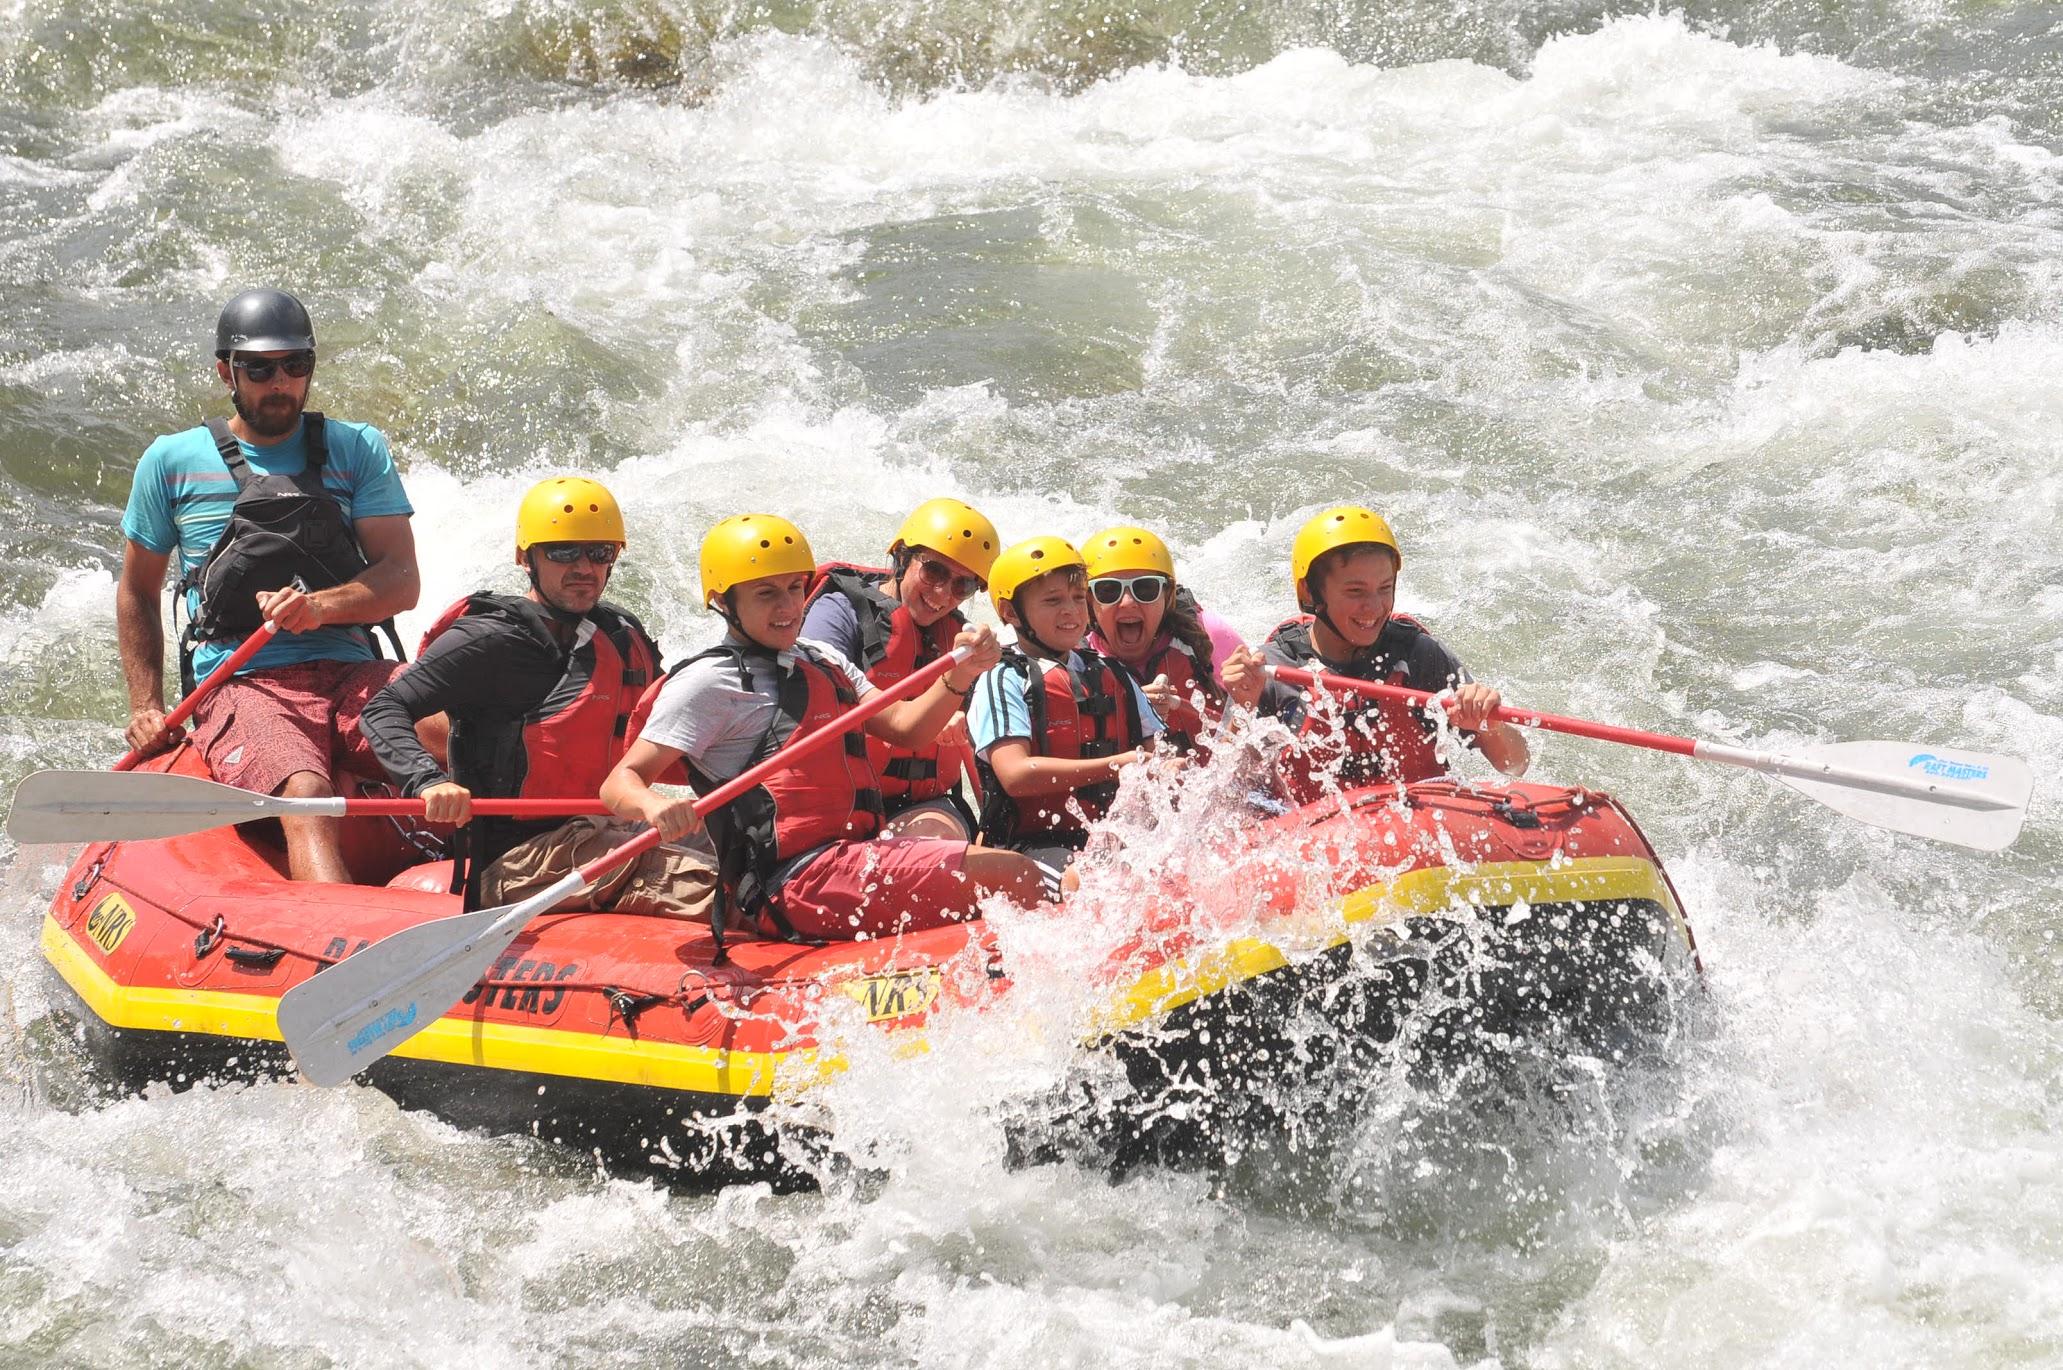 Boat & Bridge - Colorado River Rafting & Whitewater Rafting